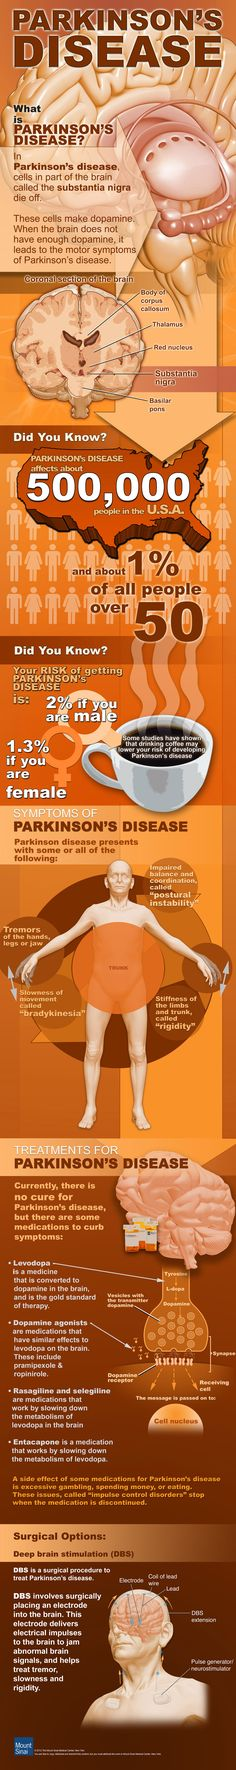 Parkinsons Disease Infographic